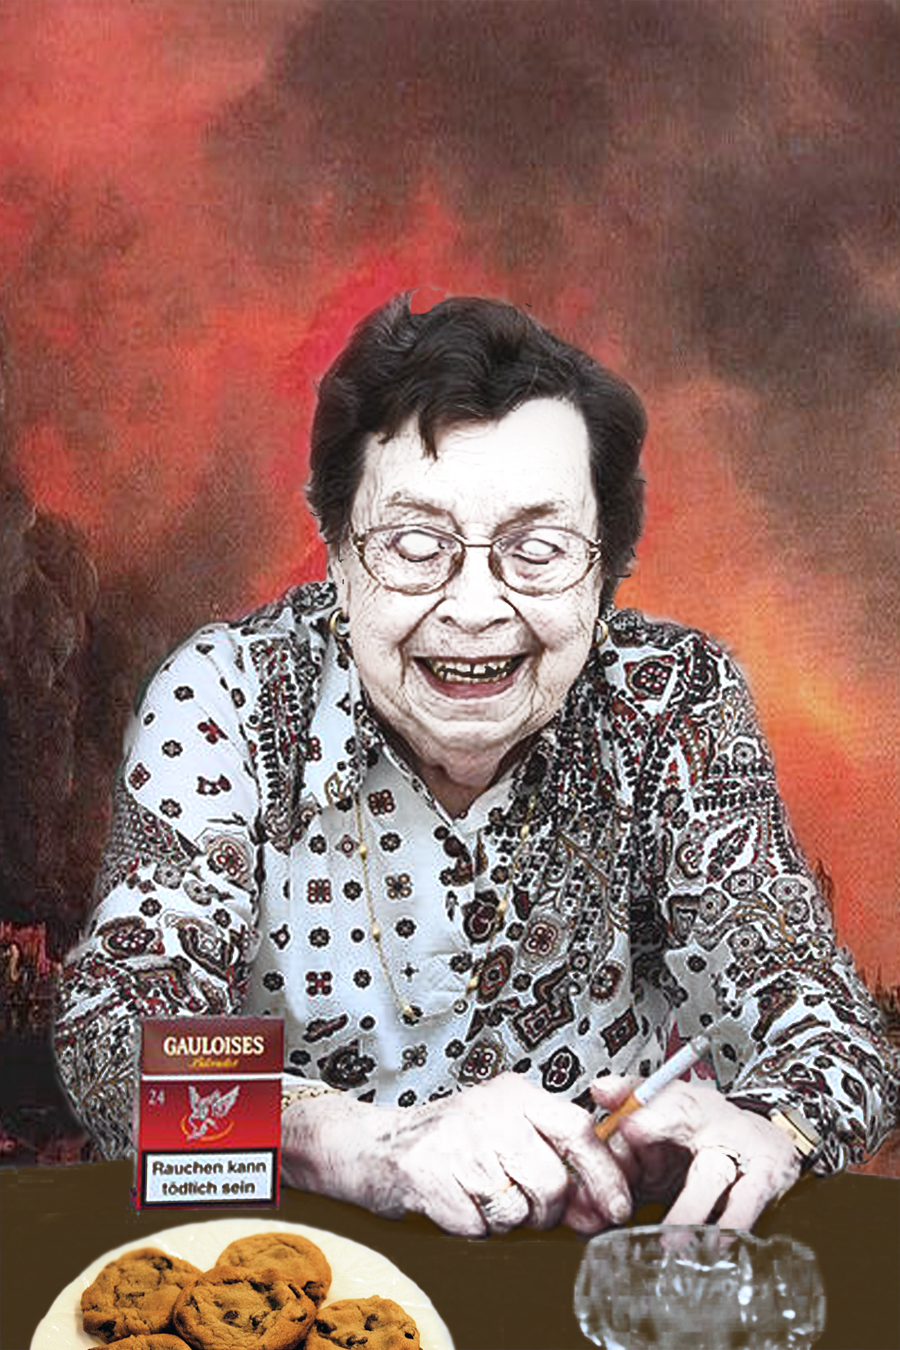 zombie grandmother brings cookies, smokes cigarette